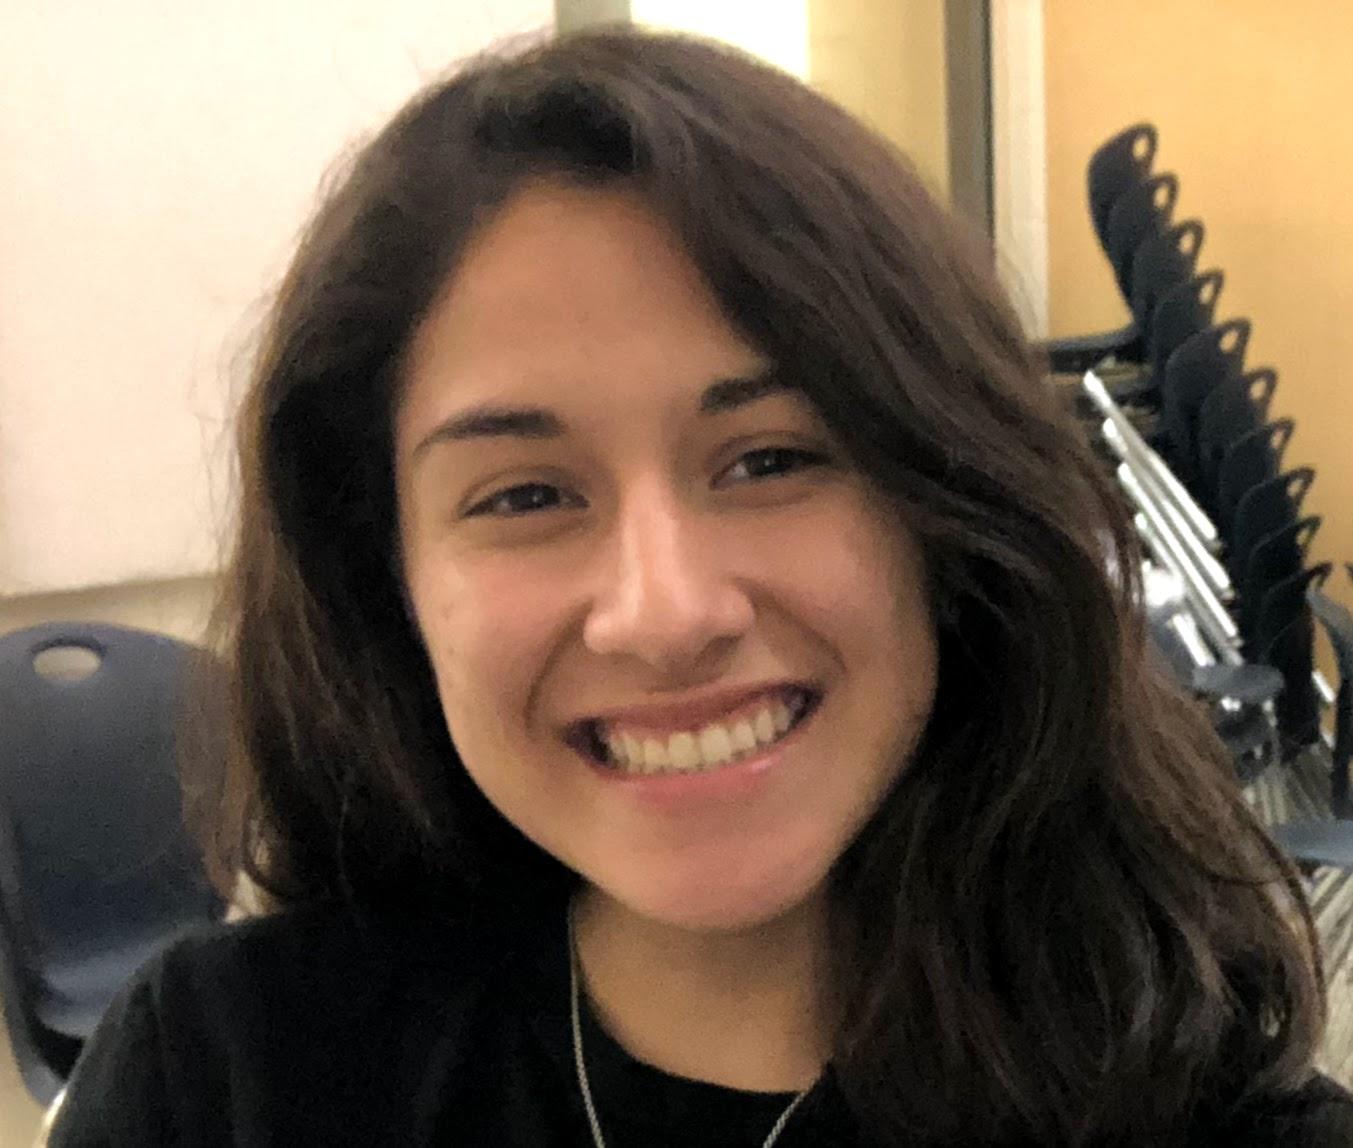 Kayla Mendez